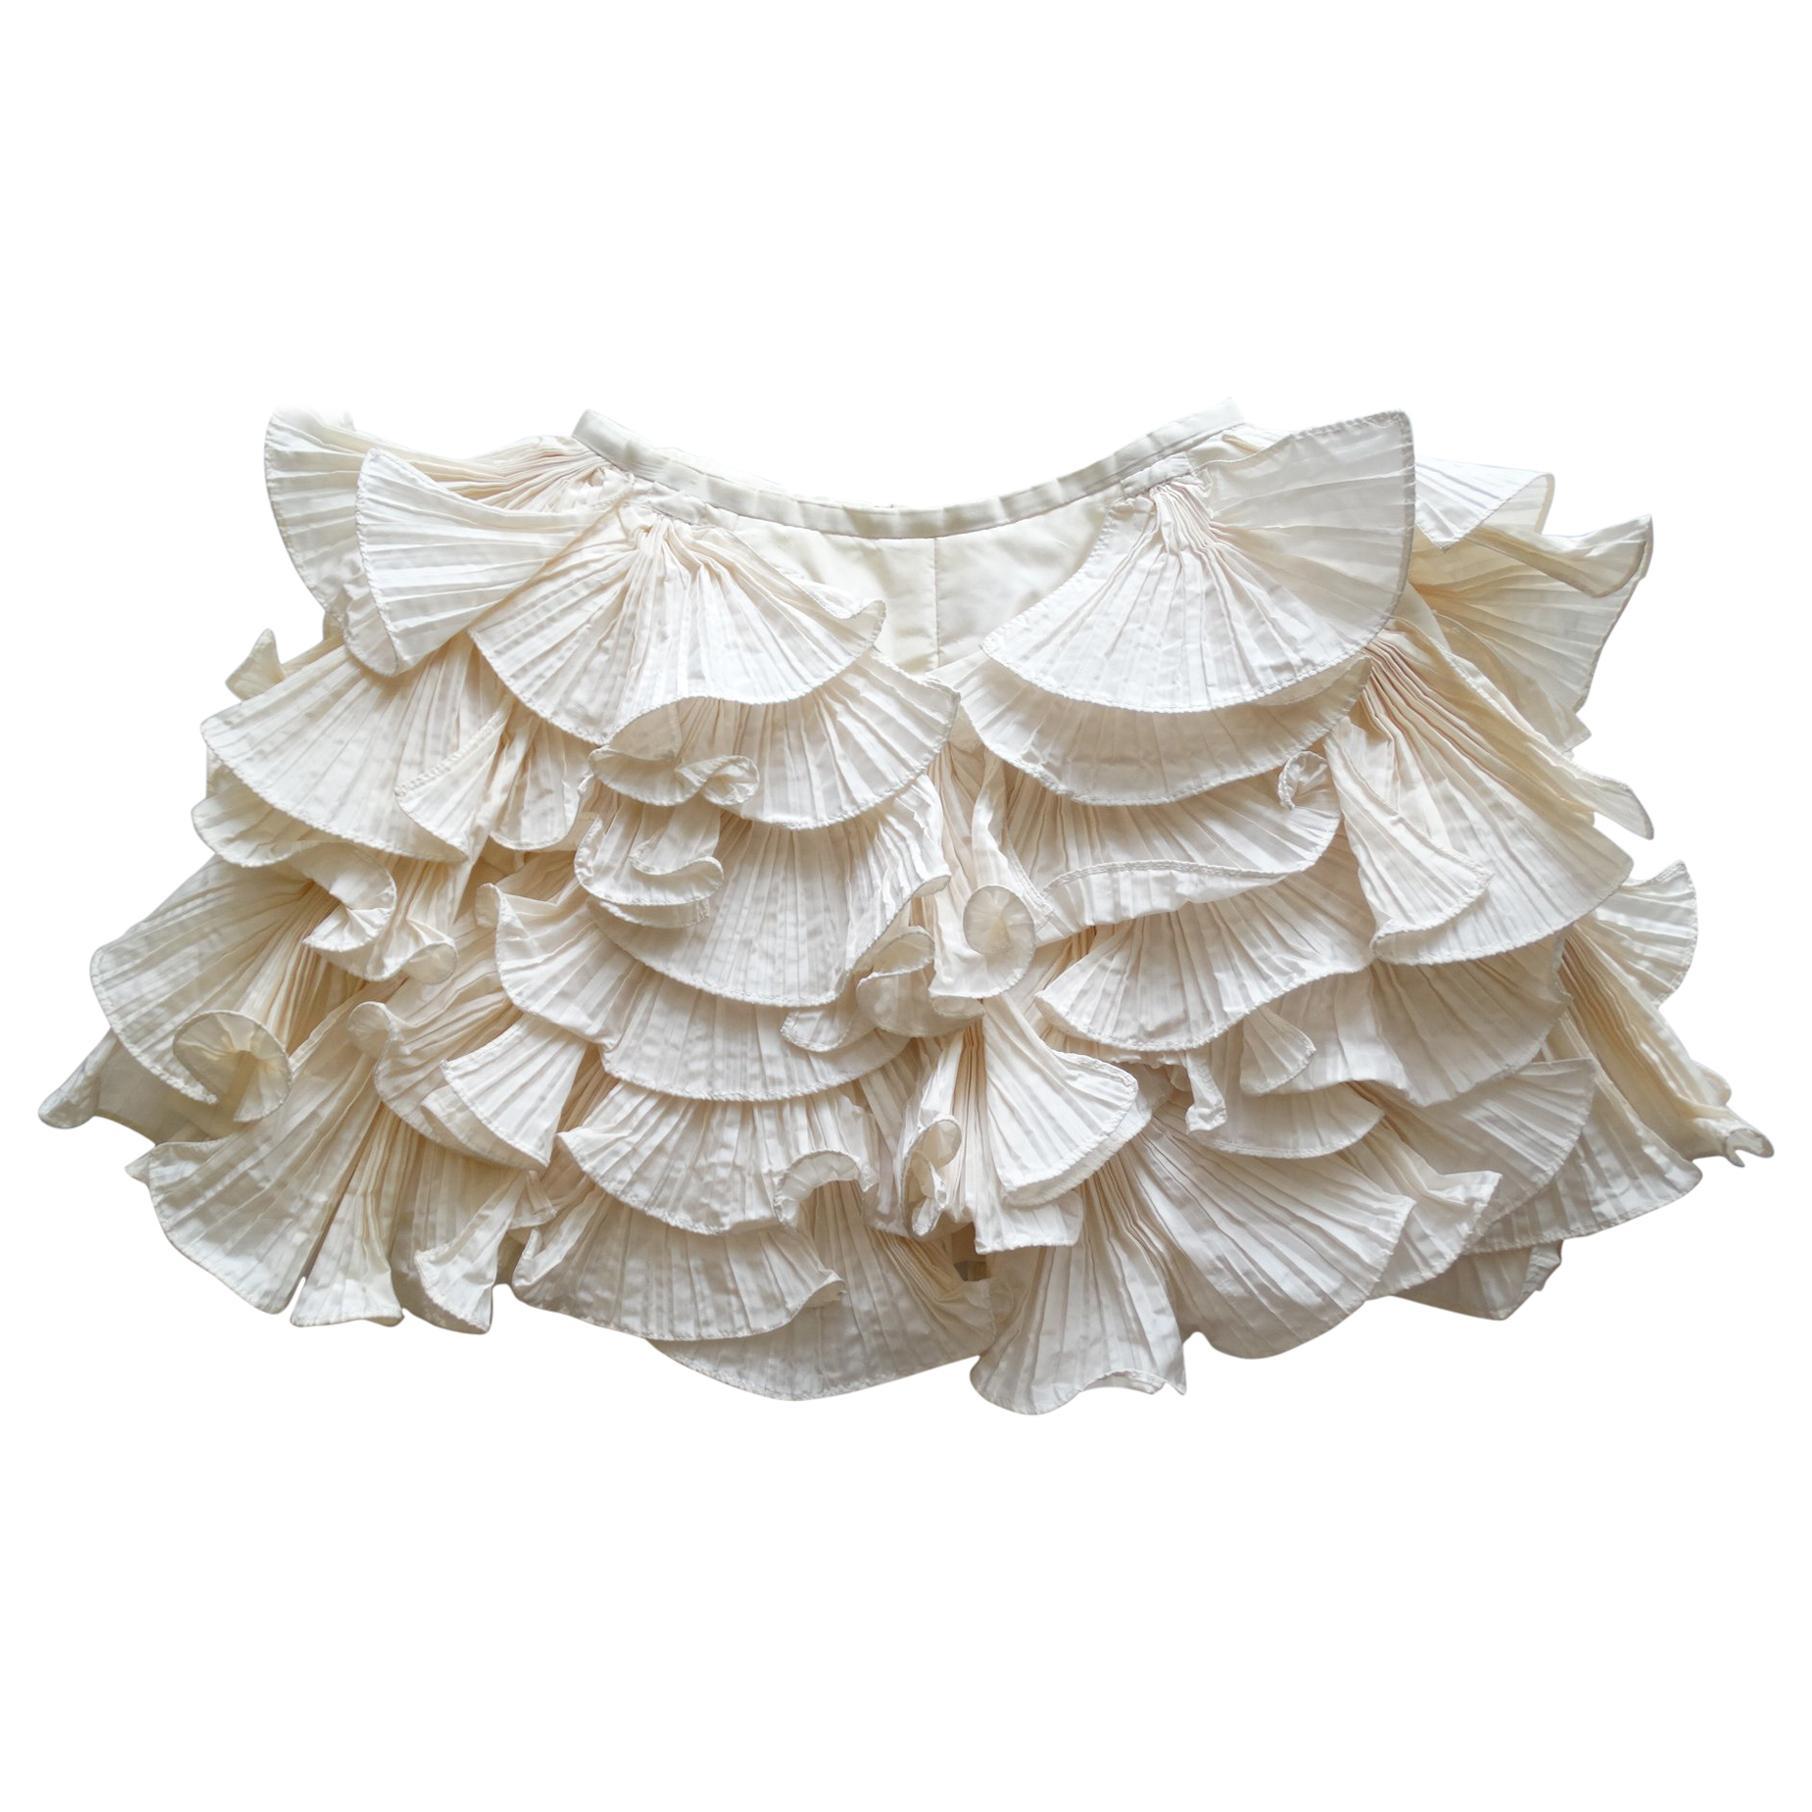 Bernard Perris 1980s Couture Cream Silk Crepe Shorts